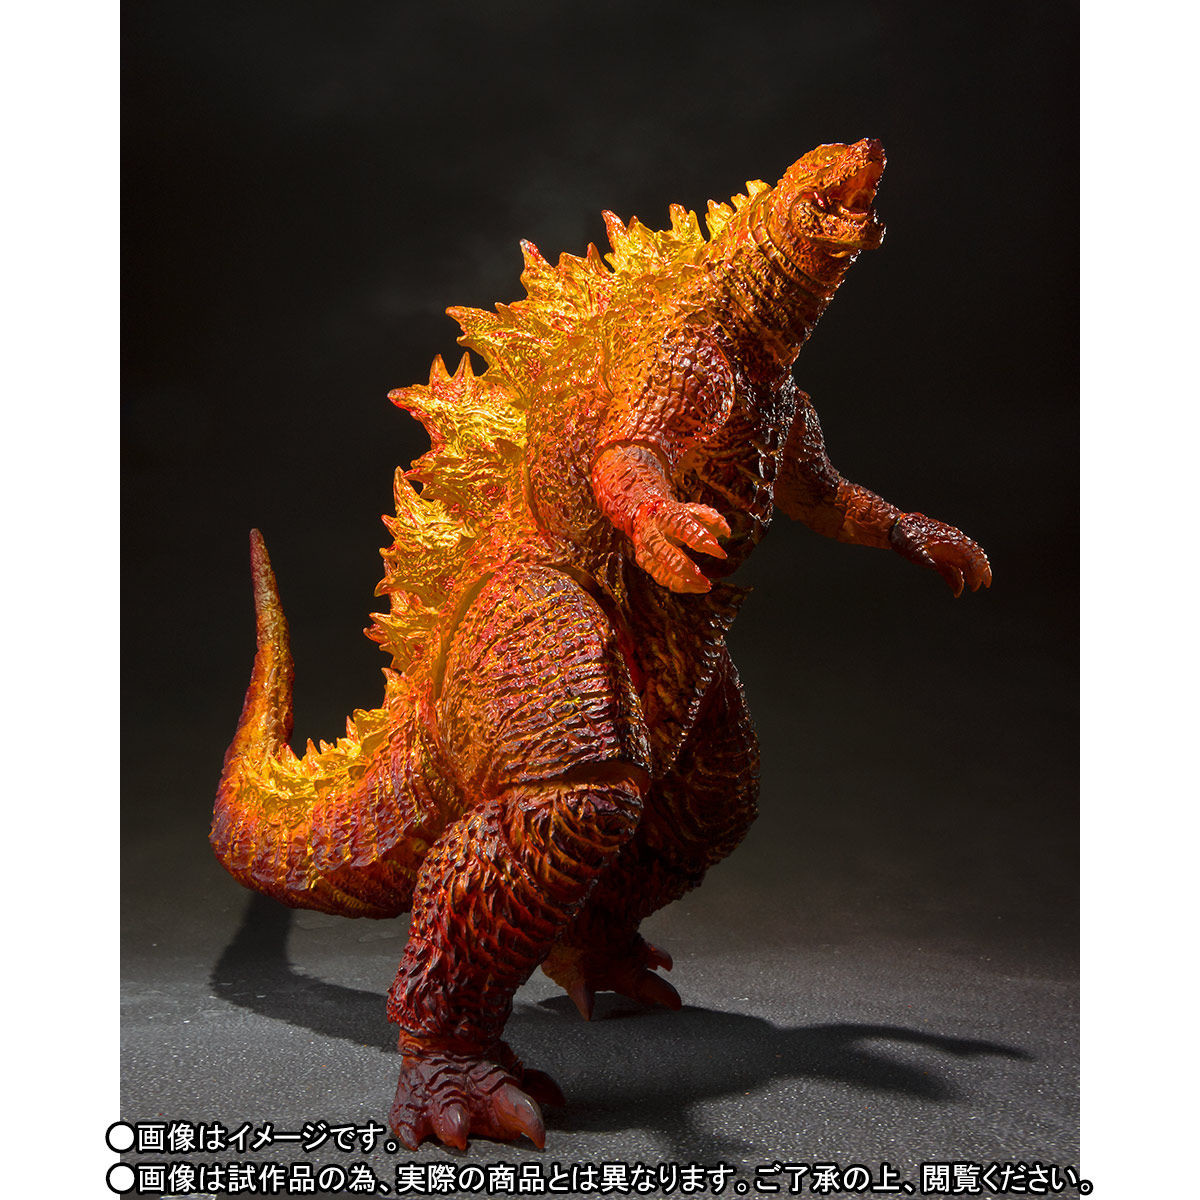 Link a burning godzilla – SH Monsterarts – 3